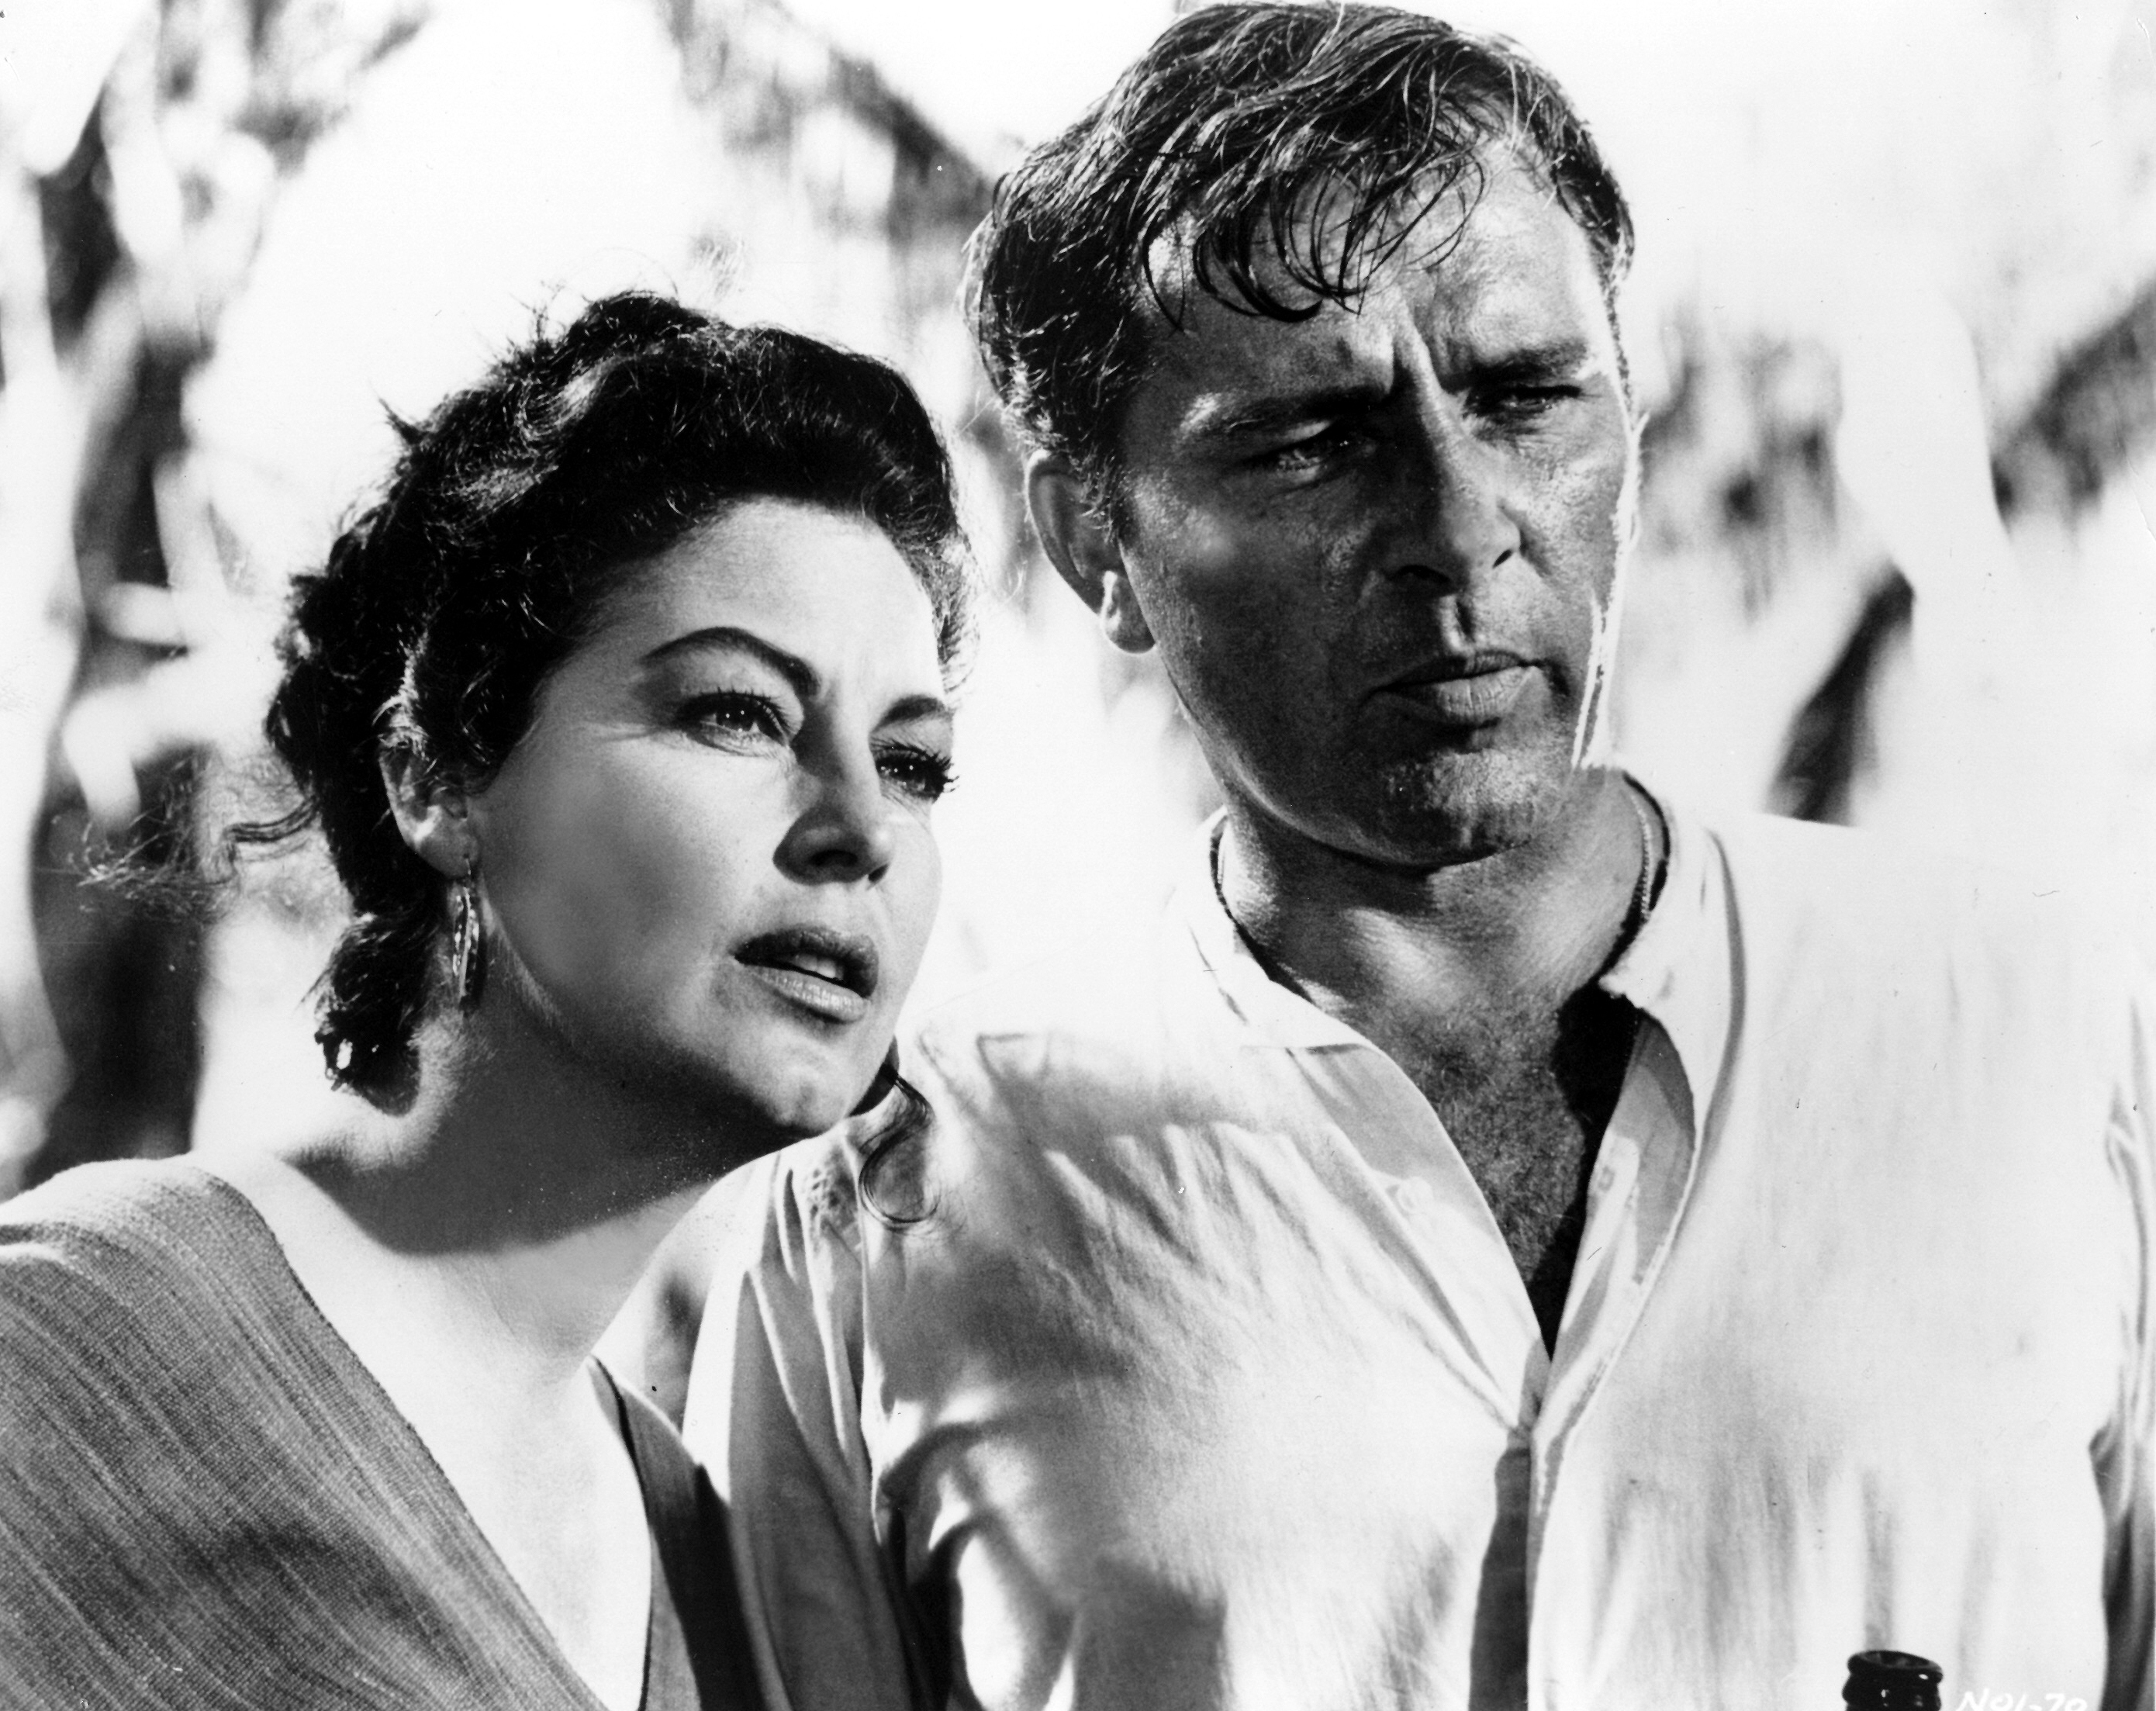 The Night of the Iguana (1964) Directed by John Huston Shown: Ava Gardner (as Maxine Faulk), Richard Burton (as Rev. Dr. T. Lawrence Shannon)